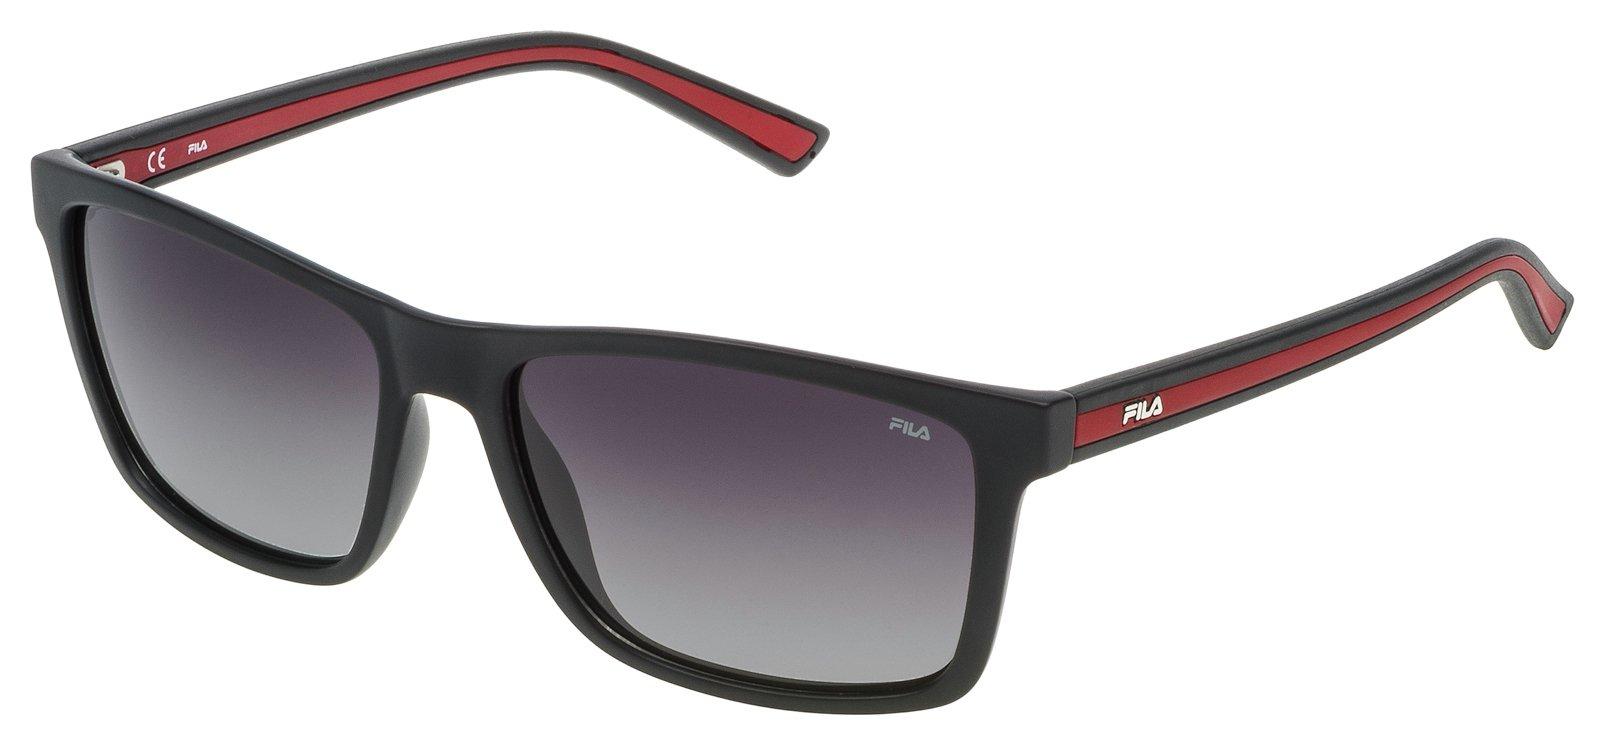 Image of Fila Shiny Black Smoke Lens Sunglasses.